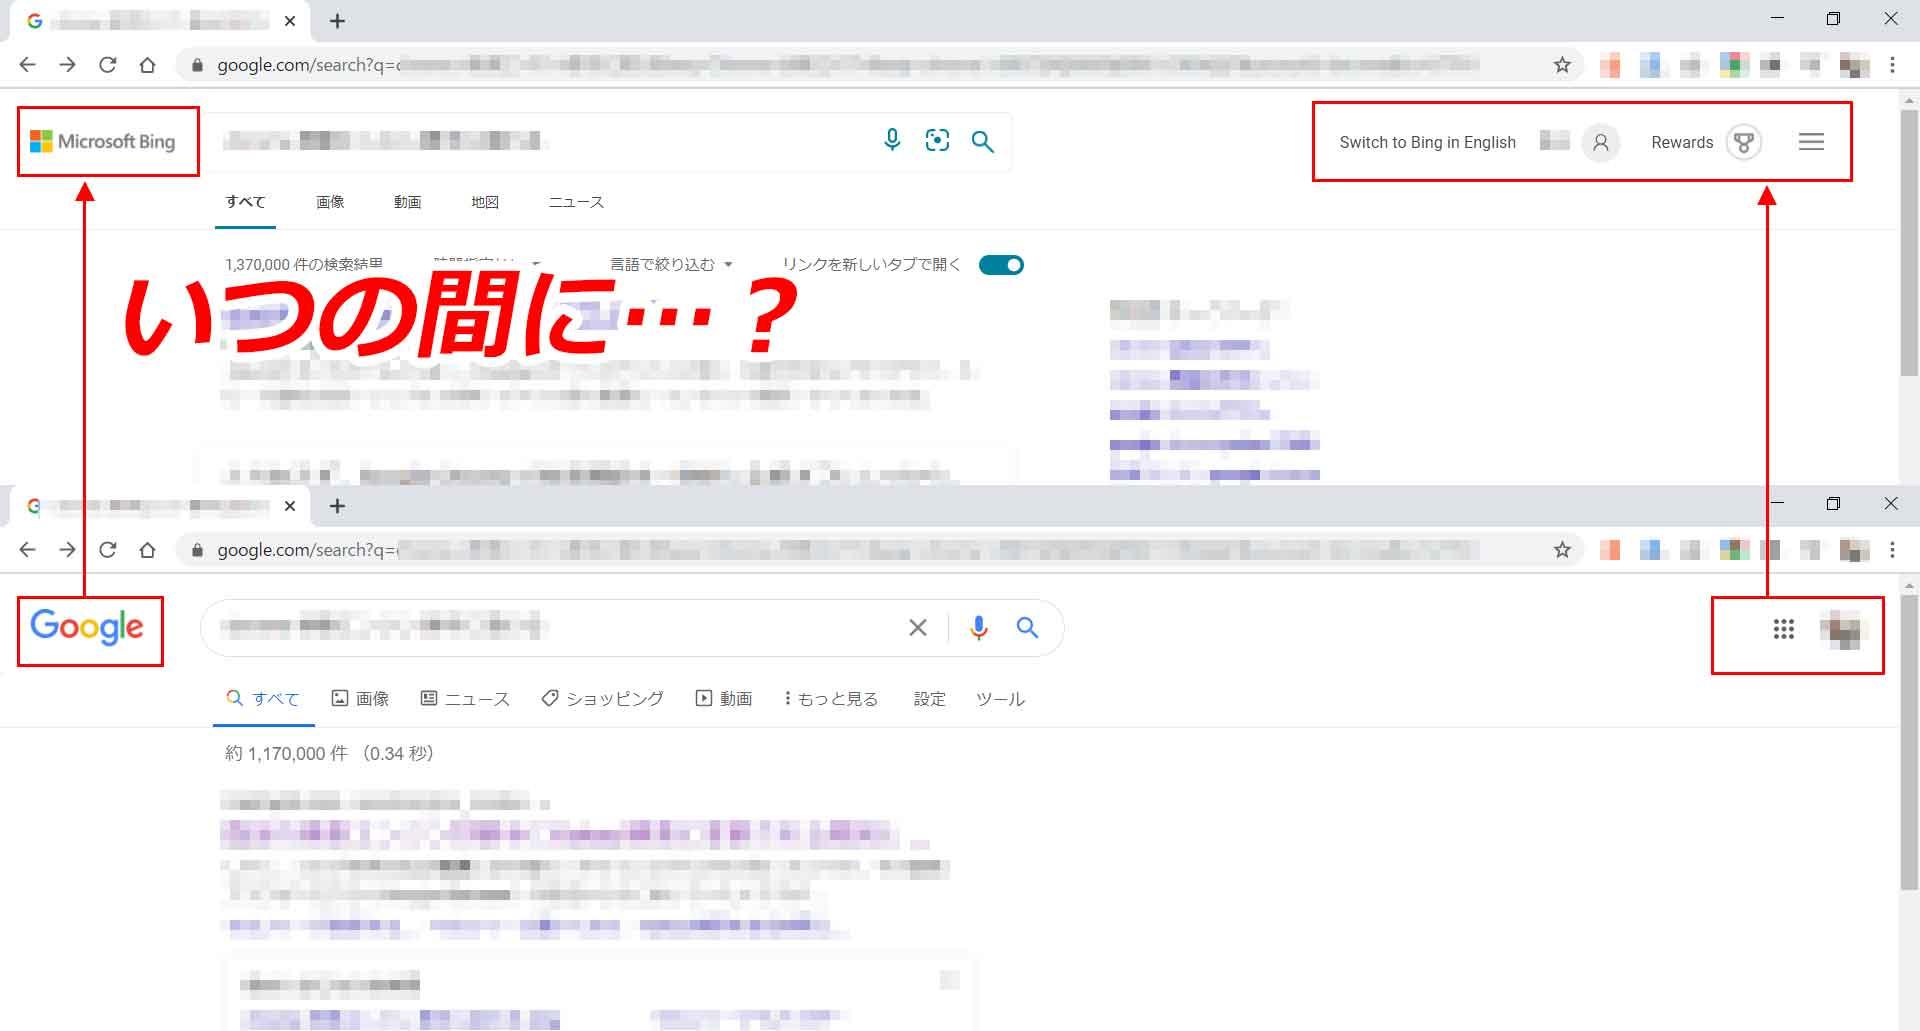 Chromeの検索エンジンがMicrosoft Bingに変わっている現象